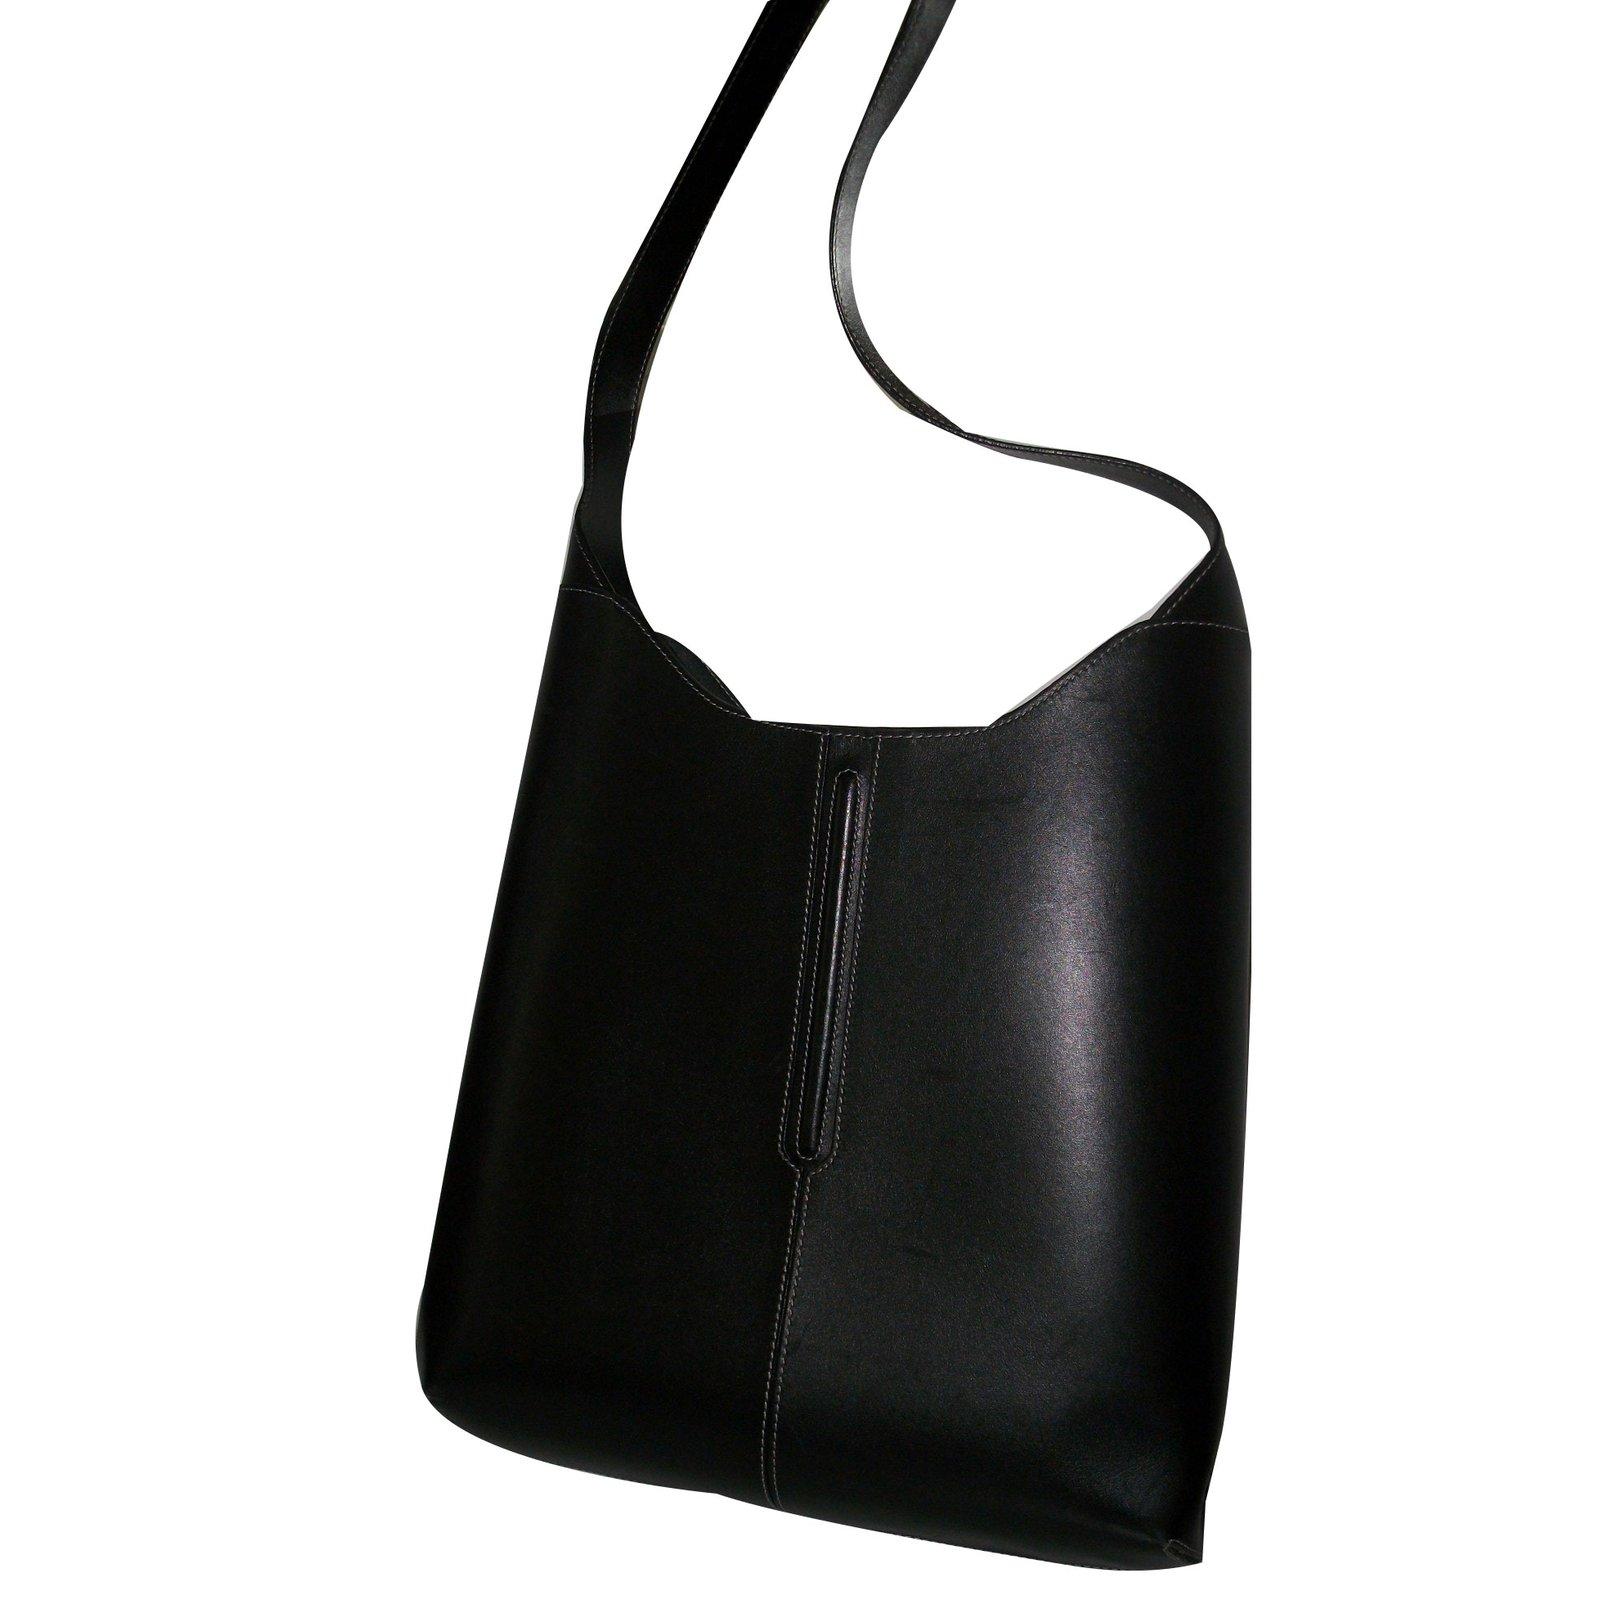 04302b0dc23c Lancel Handbags Handbags Leather Black ref.65715 - Joli Closet